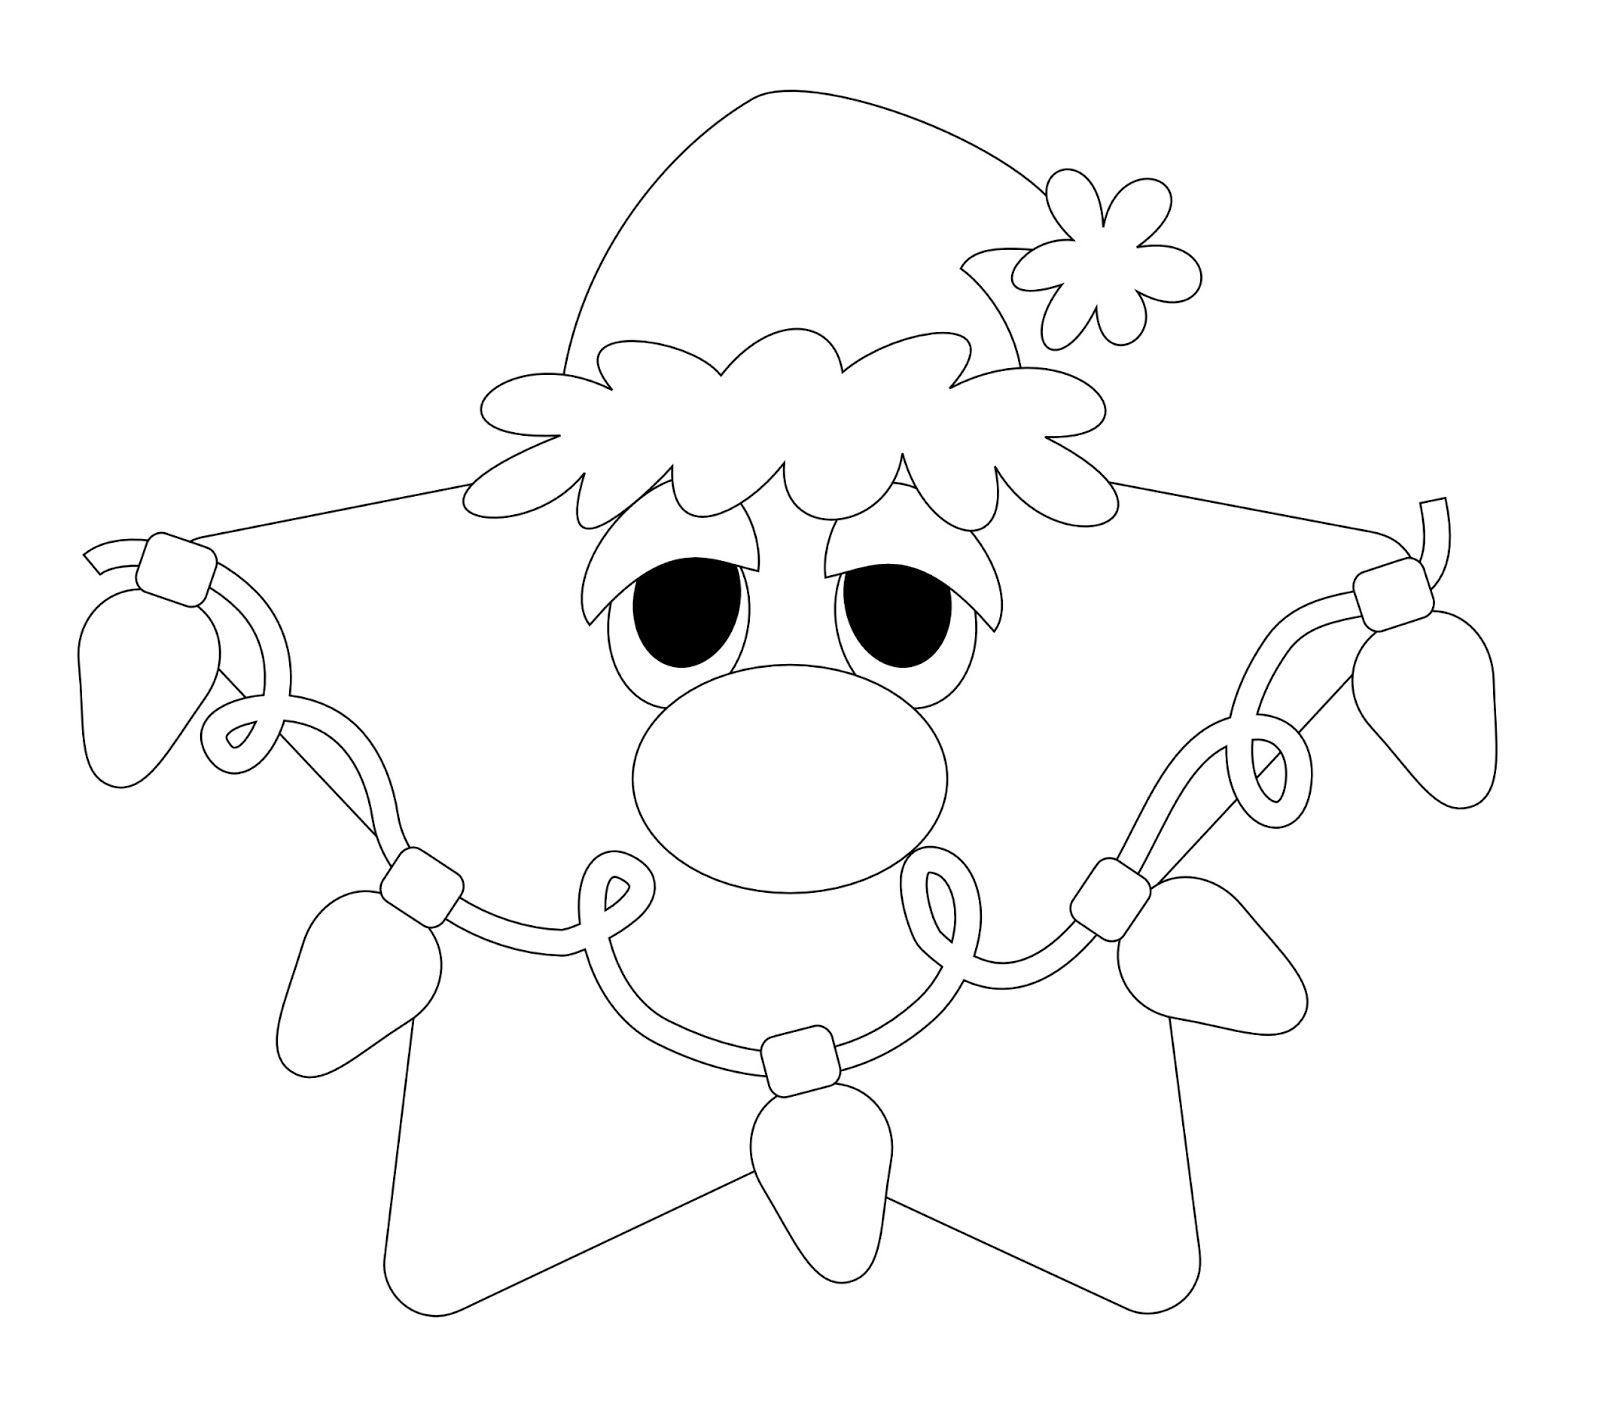 Little Scraps of Heaven Designs: FREE Christmas Star Digi Stamp